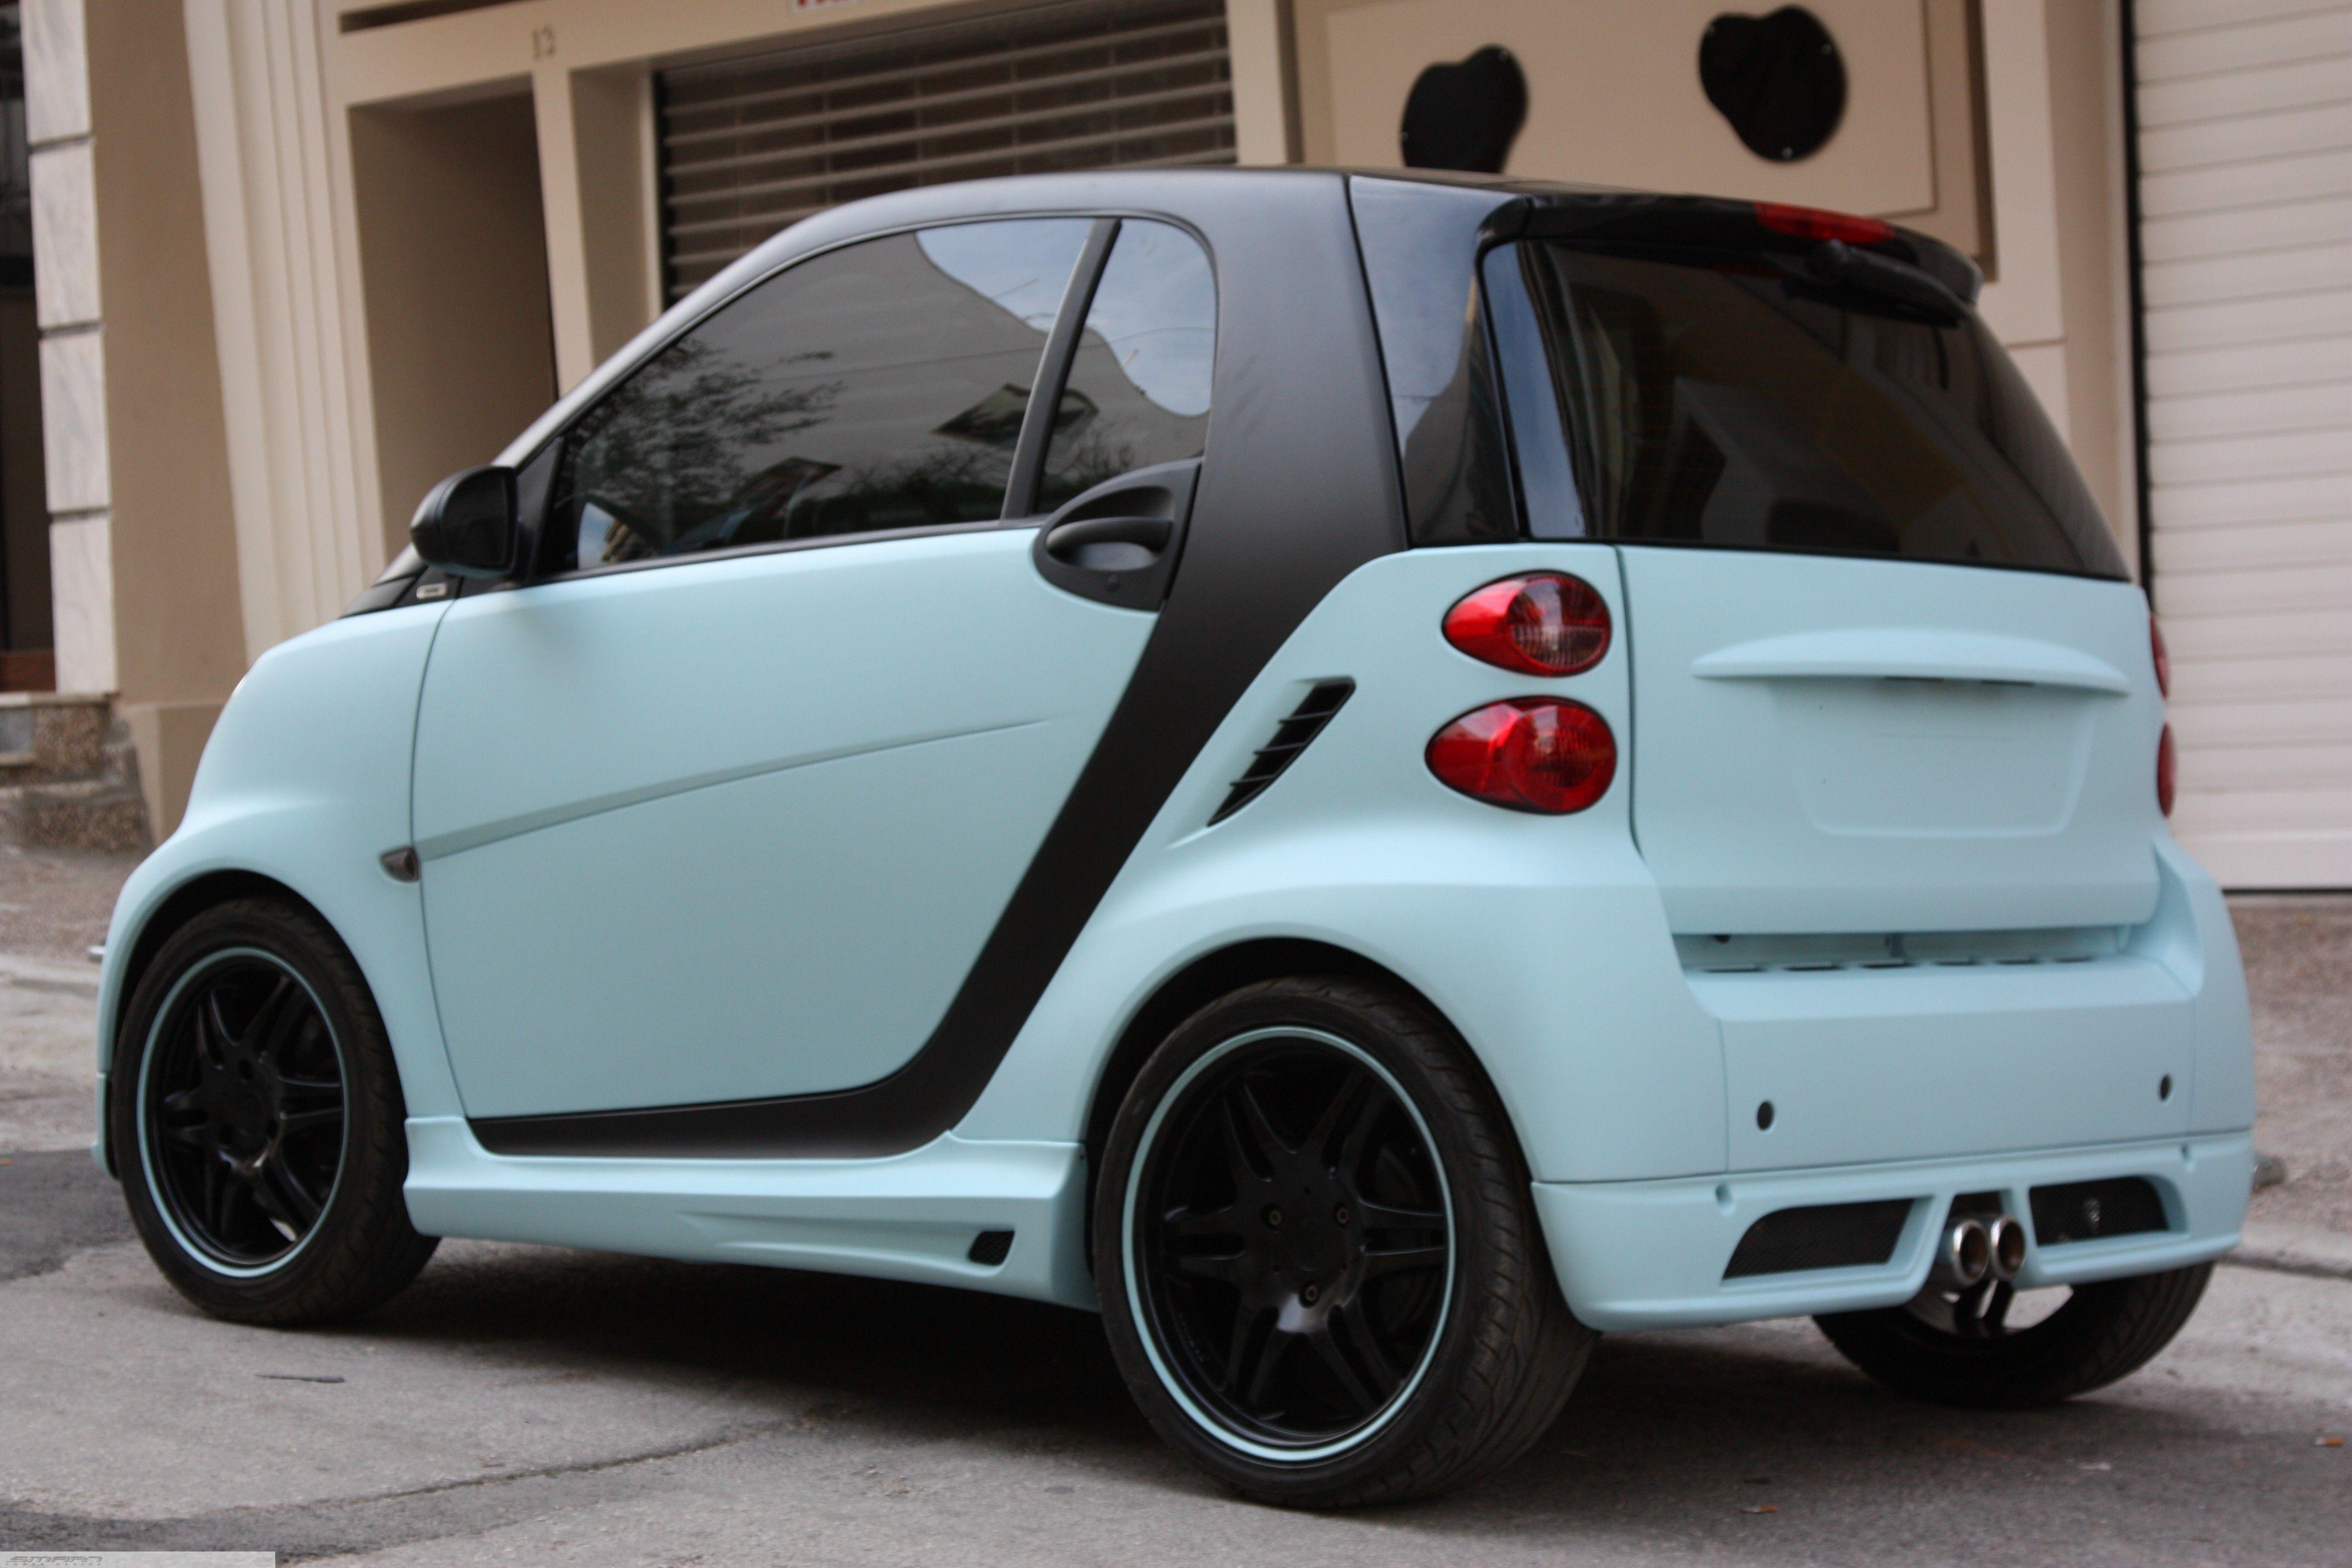 pin by jackie parker wilson on smart cars smart car body. Black Bedroom Furniture Sets. Home Design Ideas